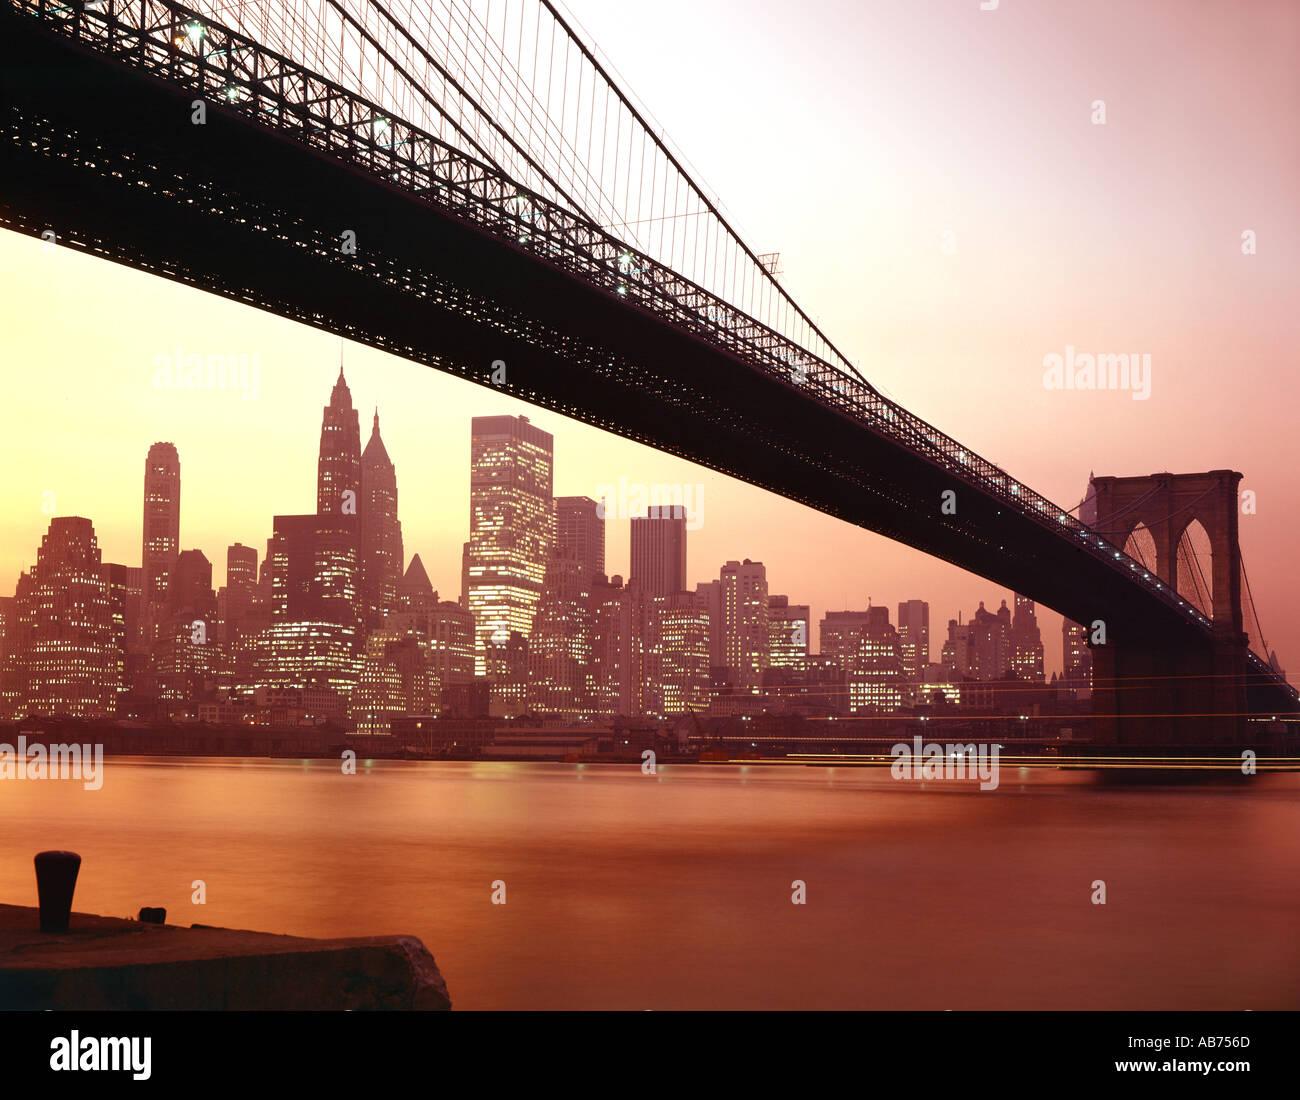 New York City and Brooklyn Bridge at dusk - Stock Image